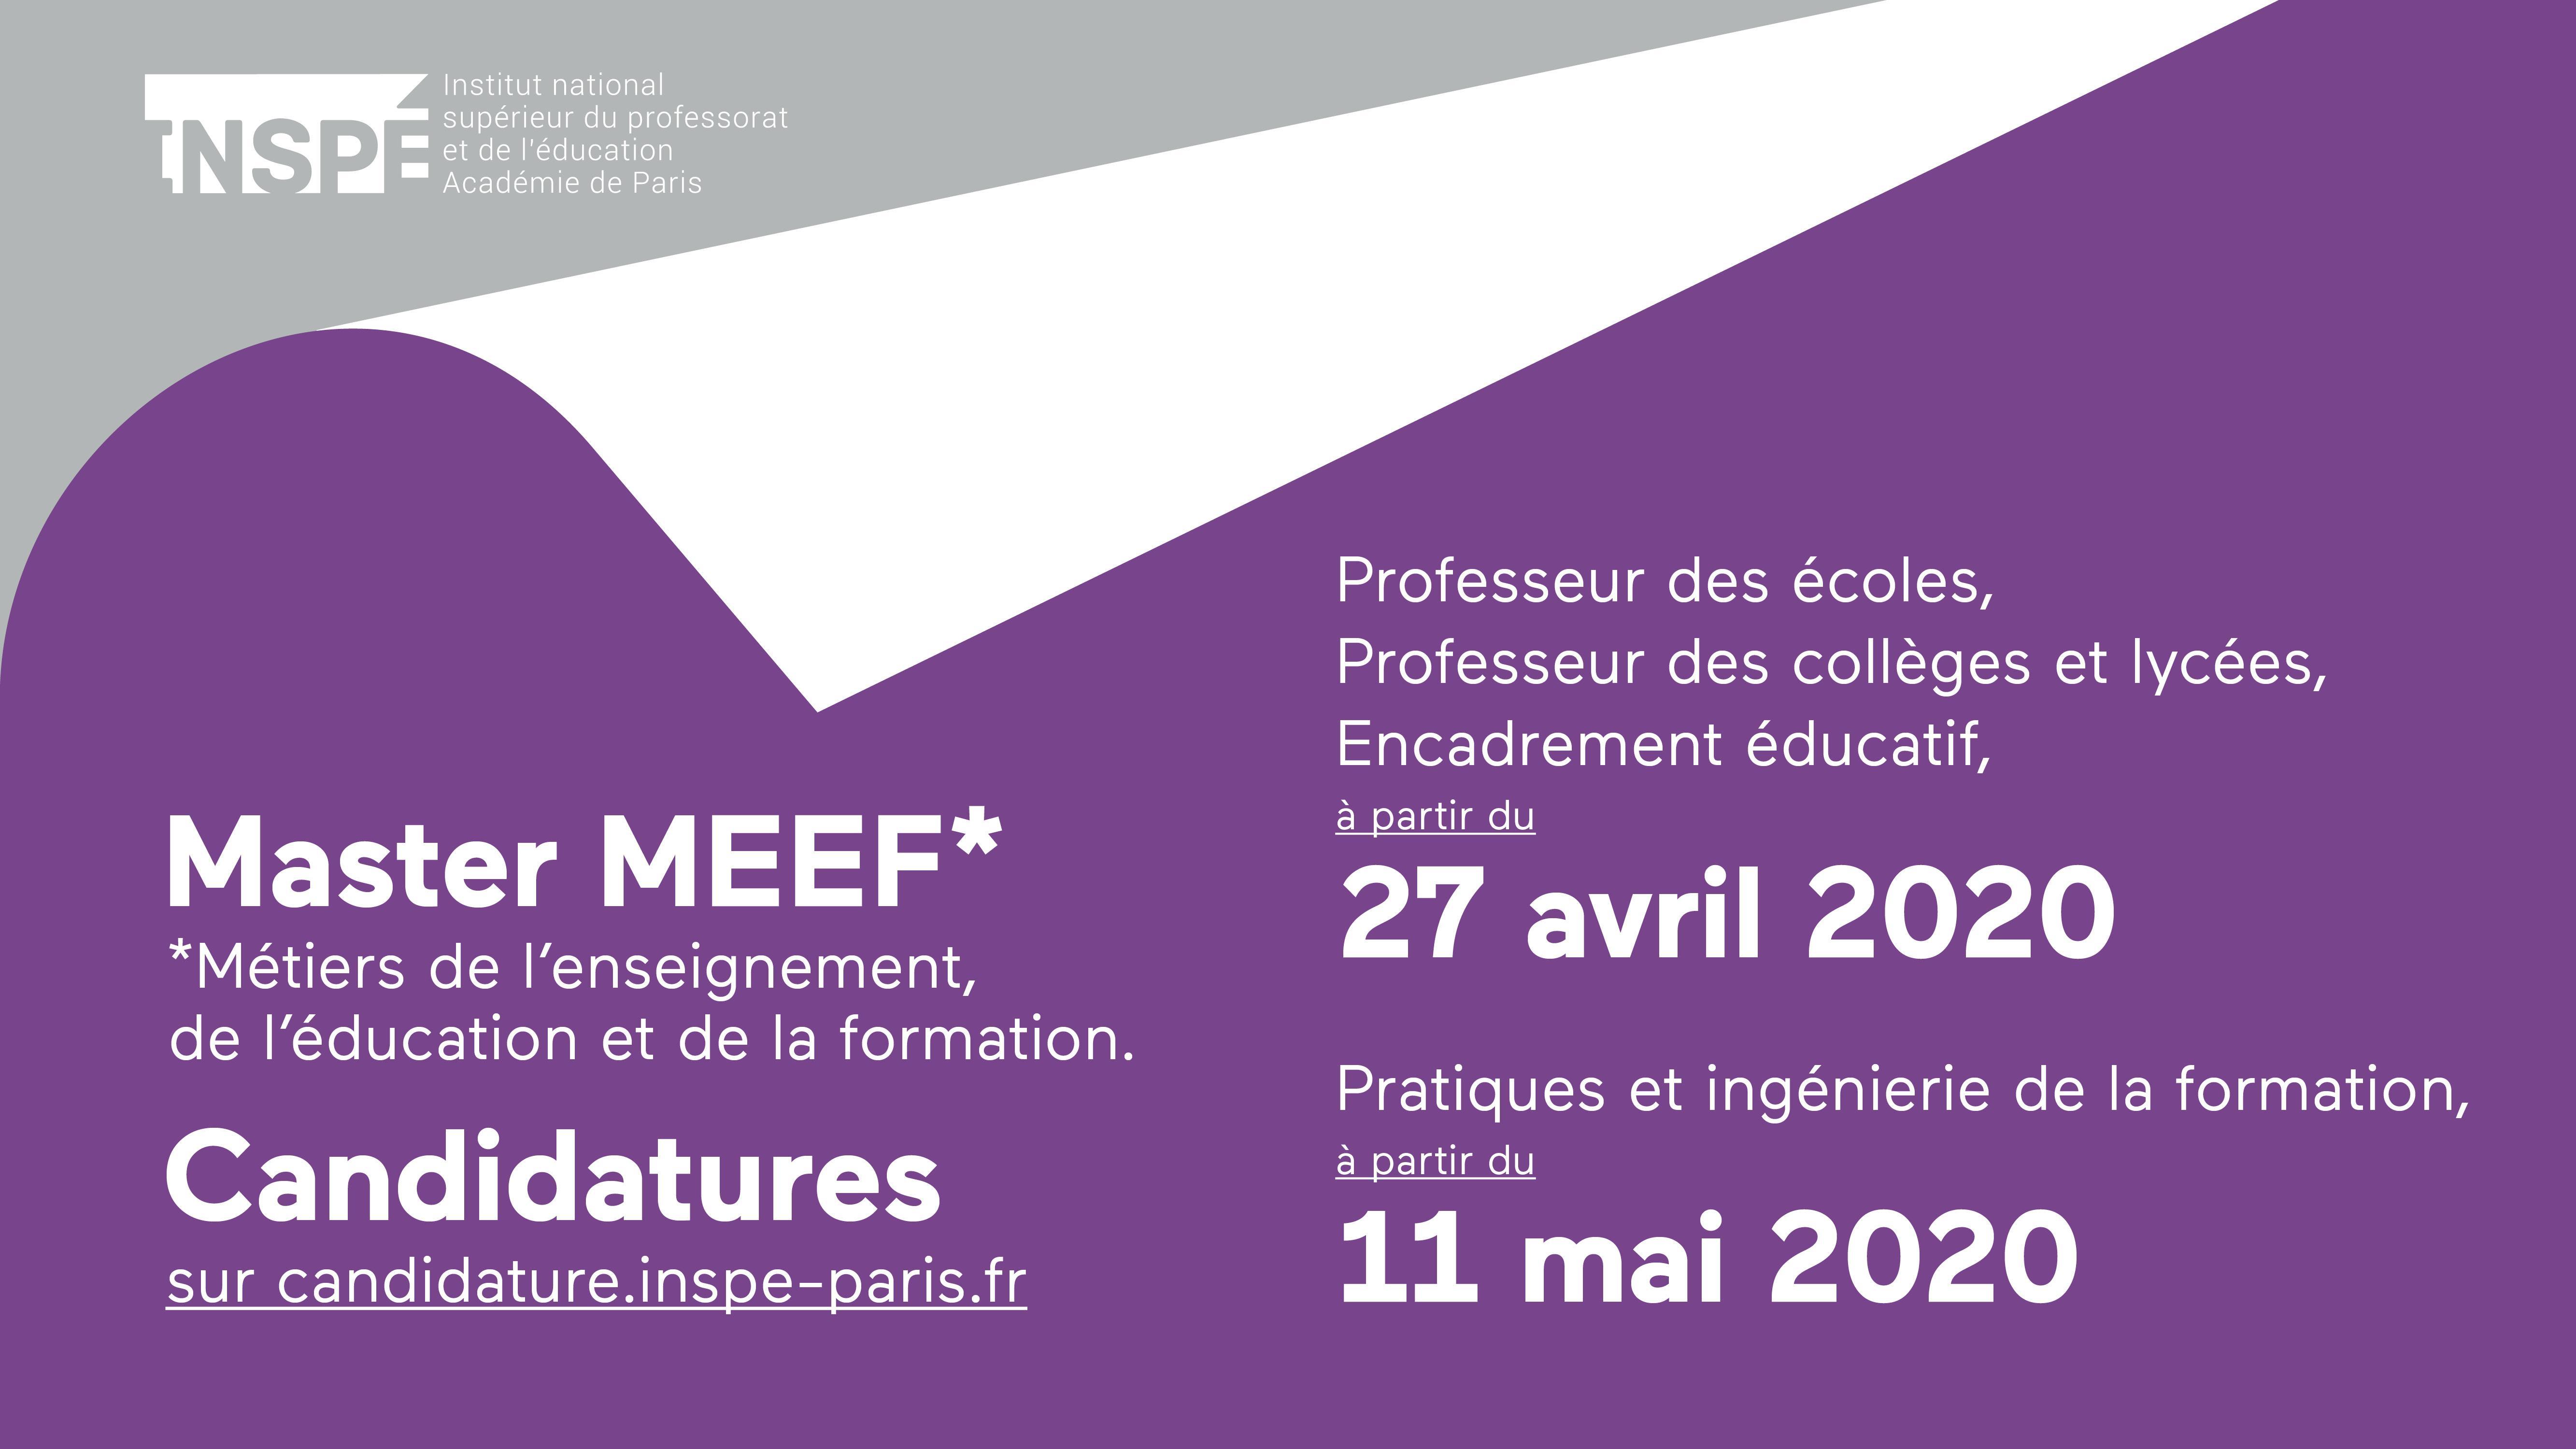 Master MEEF : appel à candidature 2020 - Affiche